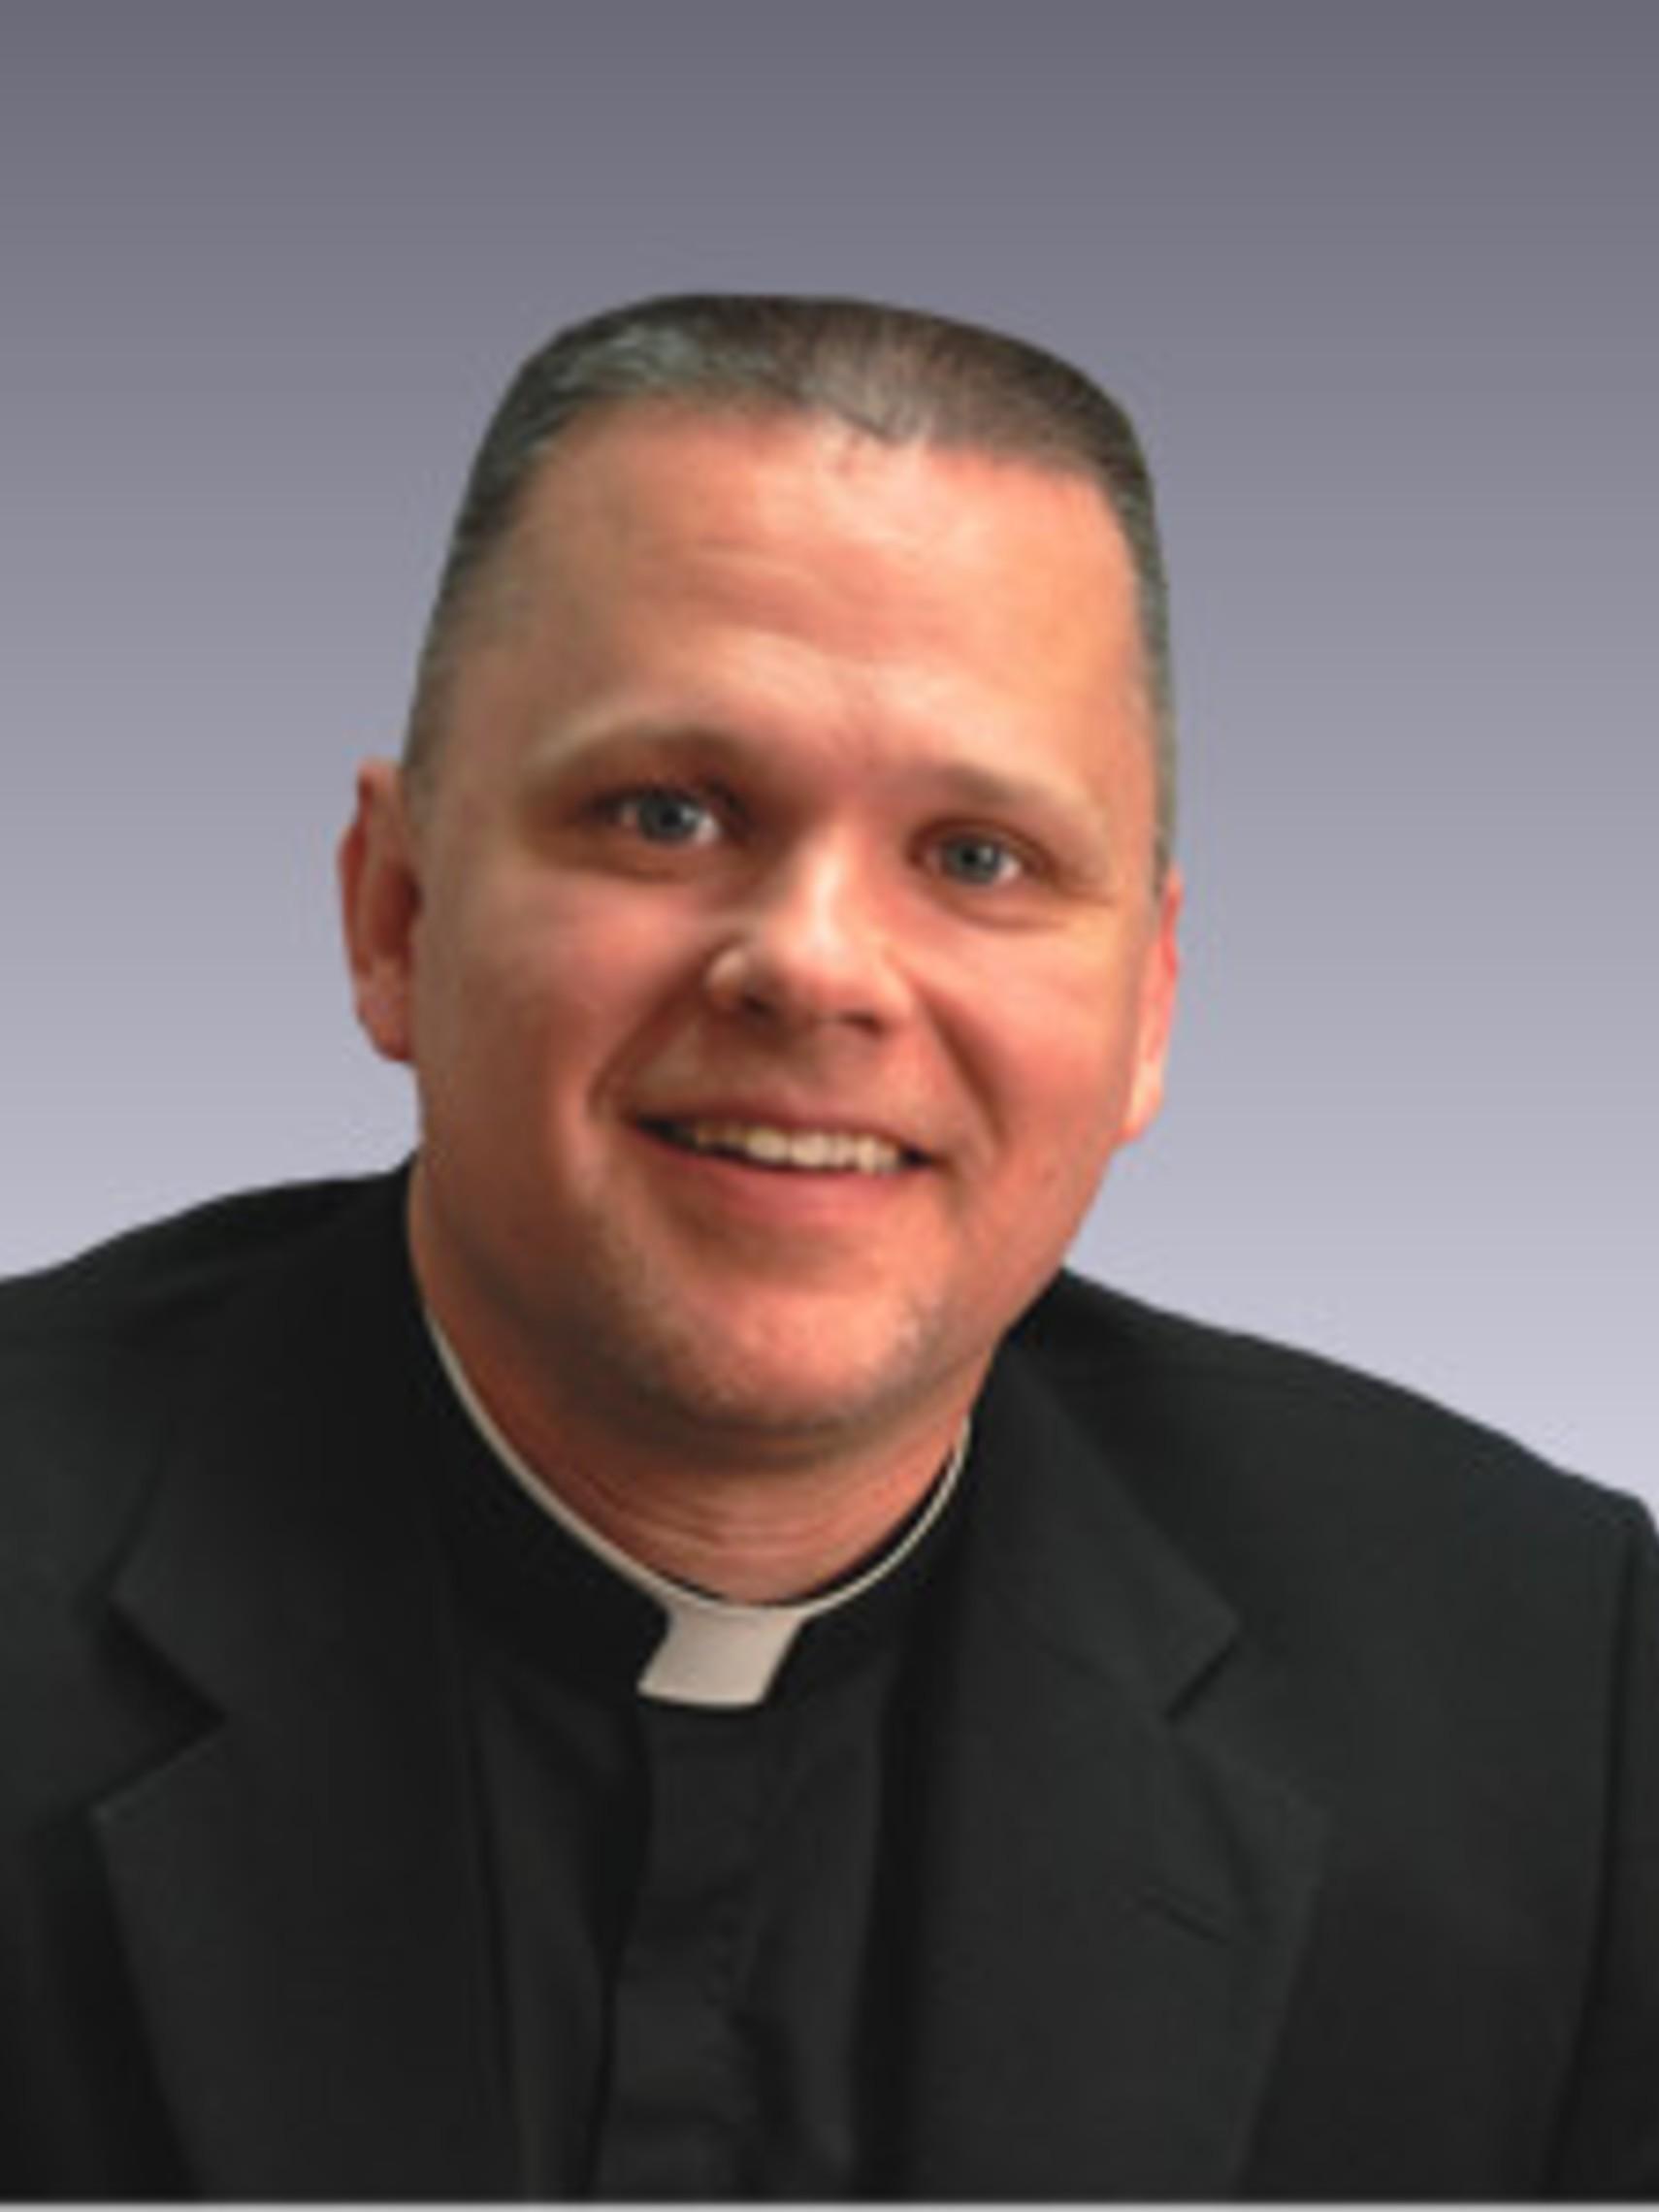 Fr. Chris Alar